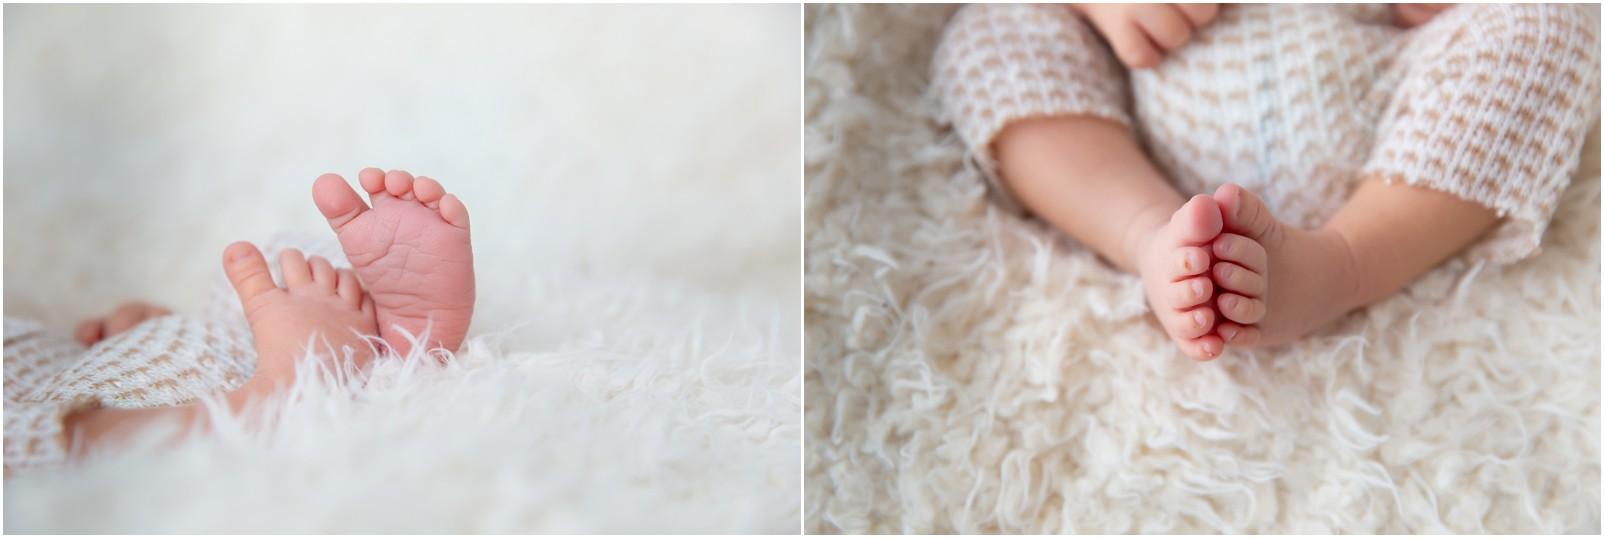 Koby's newborn session, Bendigo_0008